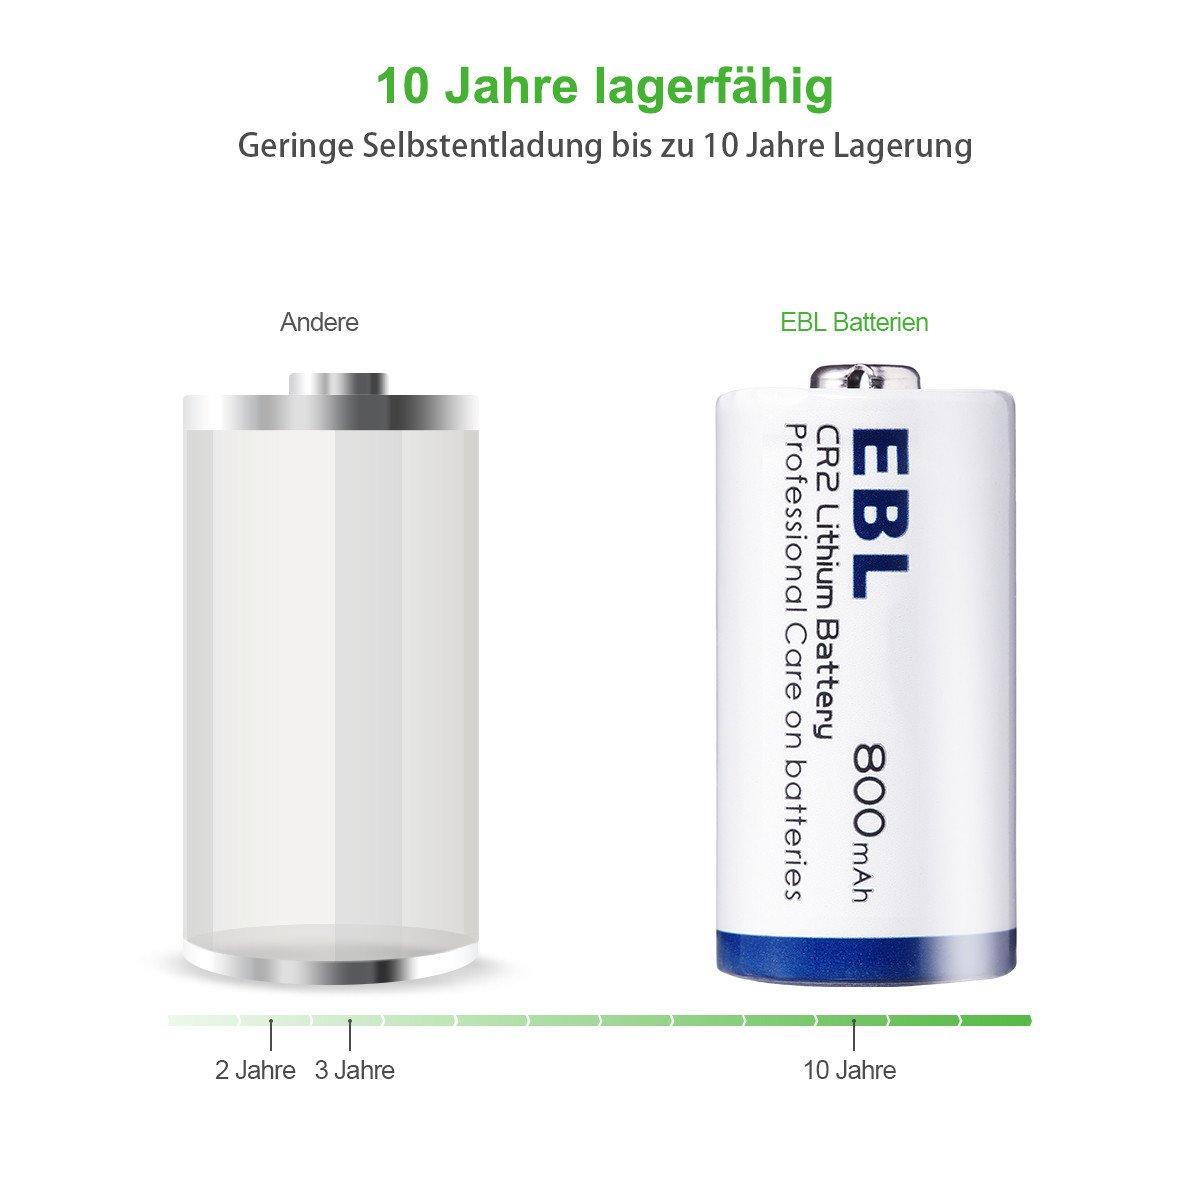 EBL CR2 Batterie 3V DL-CR2 Lithium Kamera Batterie mit PTC Schutz, ideal für Sofortbildkamera Mini 25 Mini 50 Mini 50S Mini 55 Pivi MP-100 & SP-1- Silver, 8 Stück